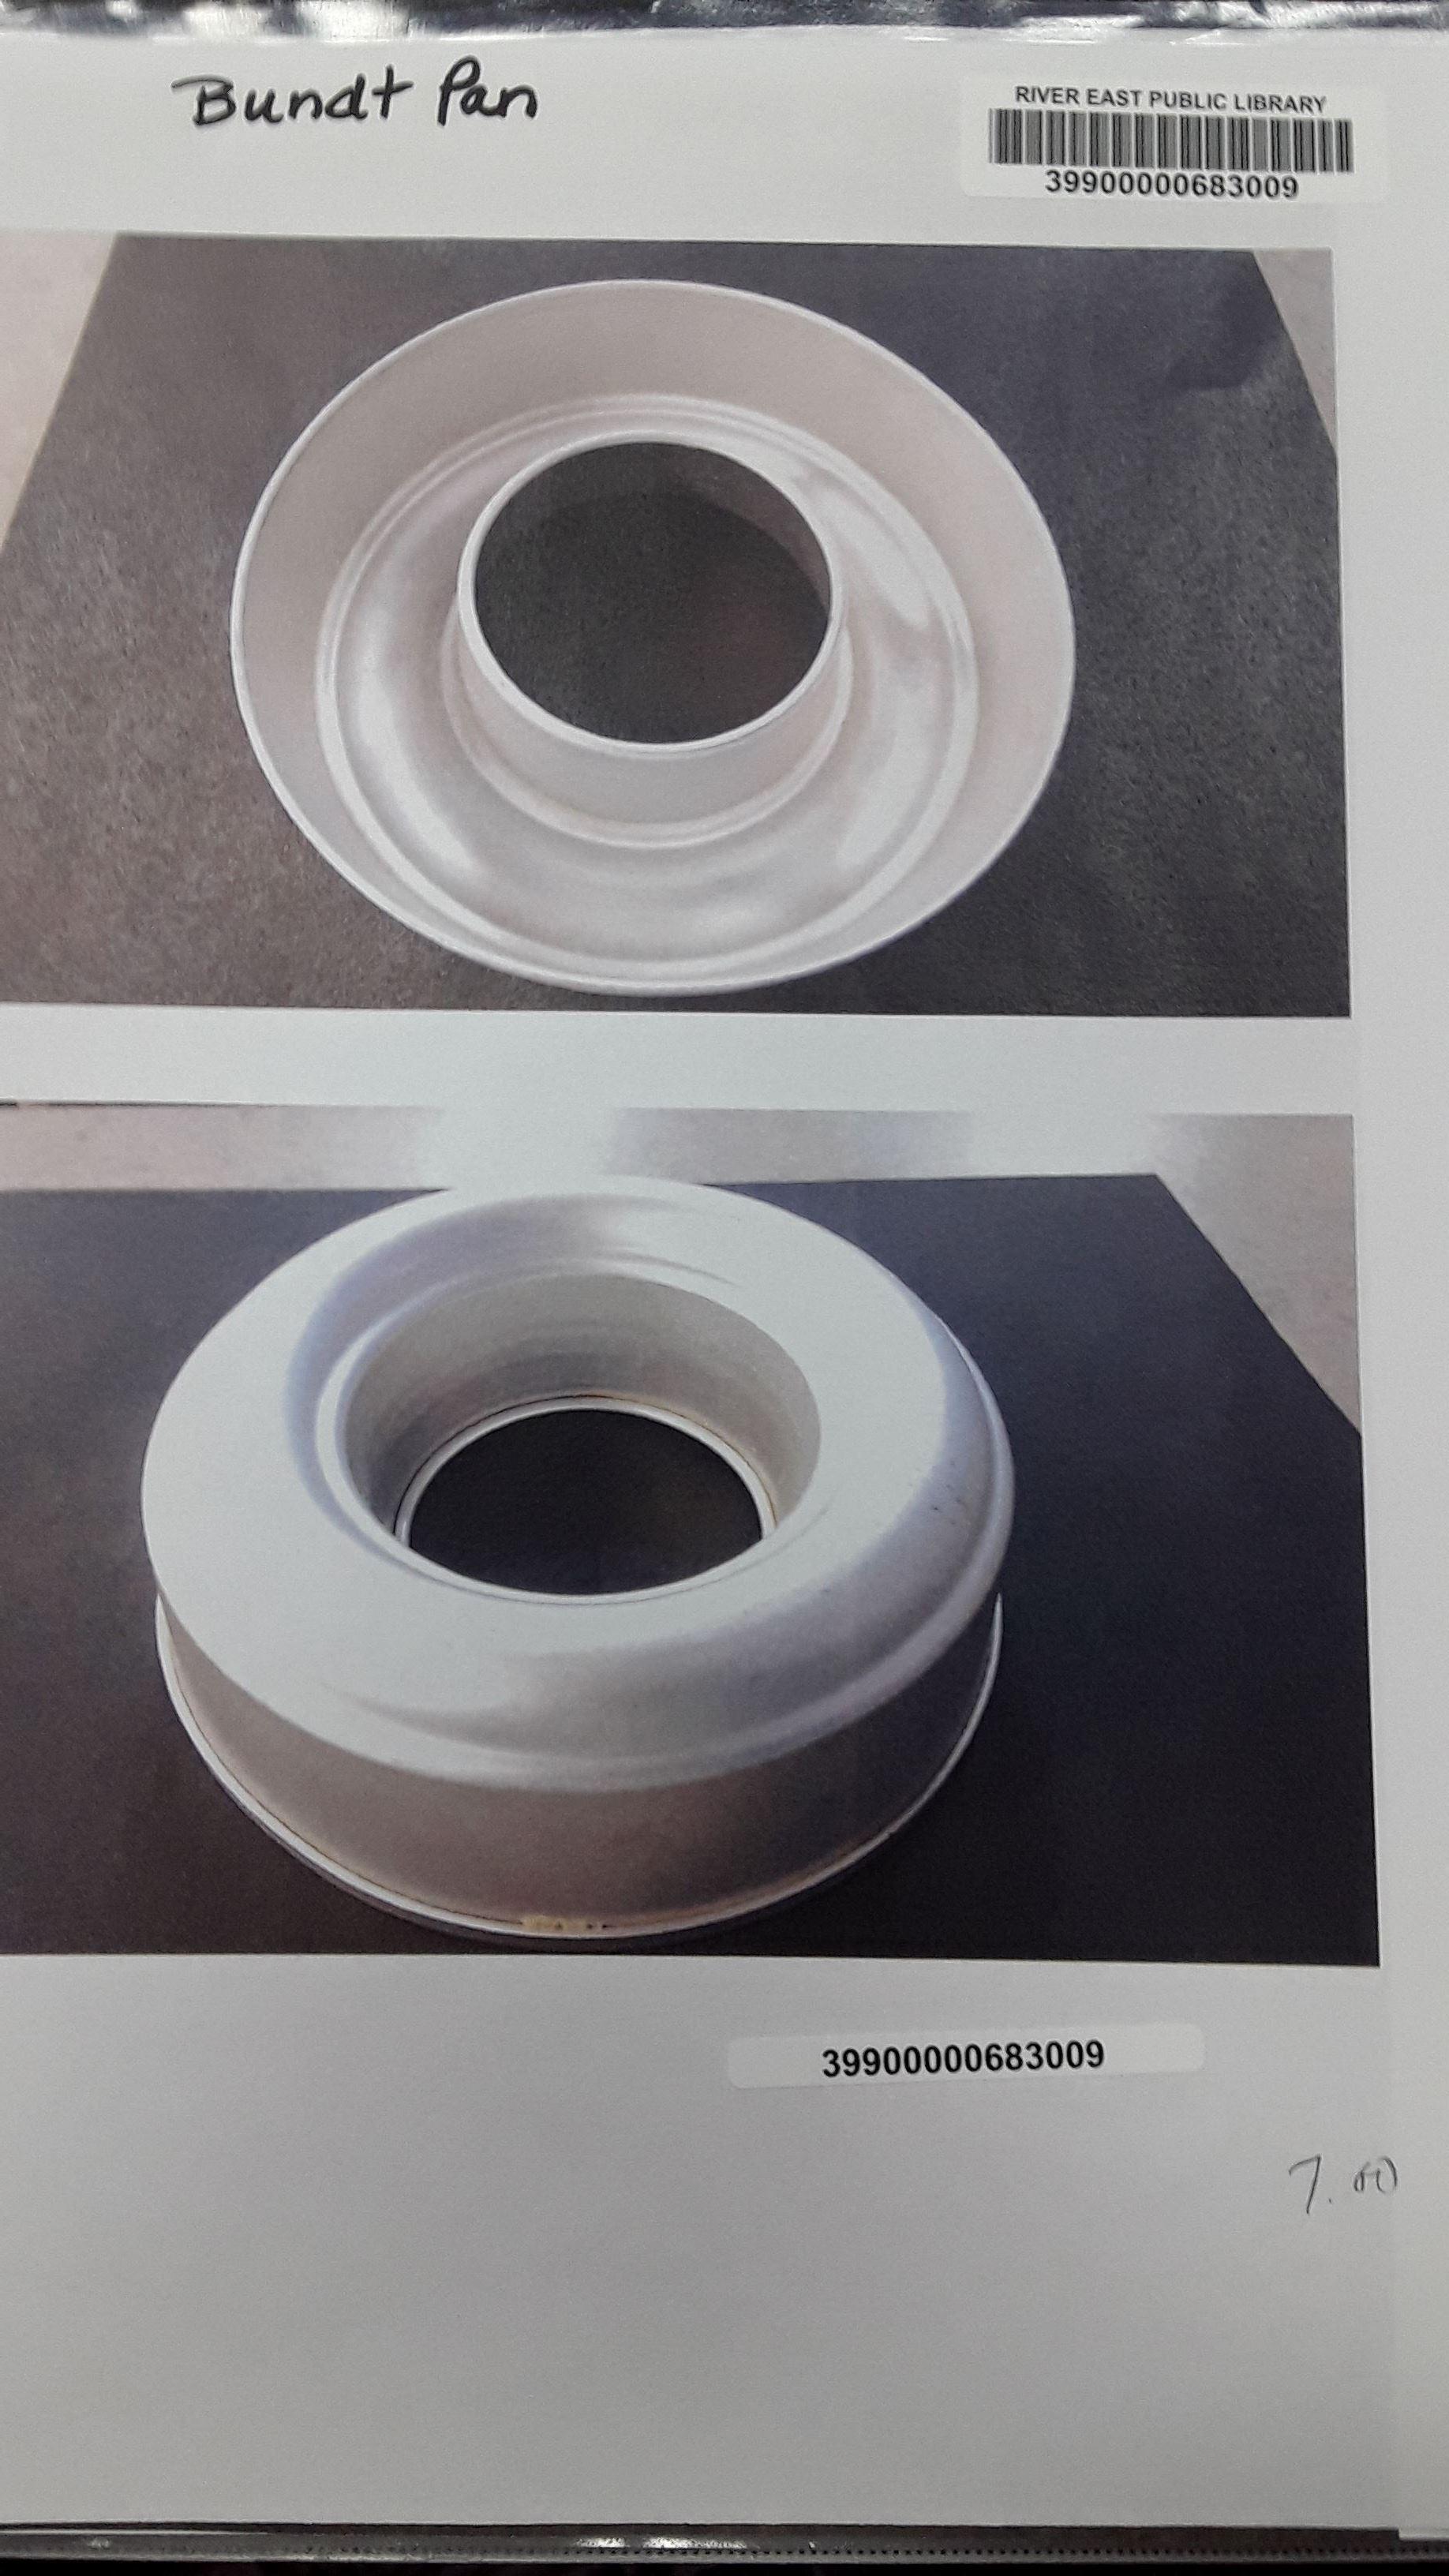 Photograph of a bundt pan